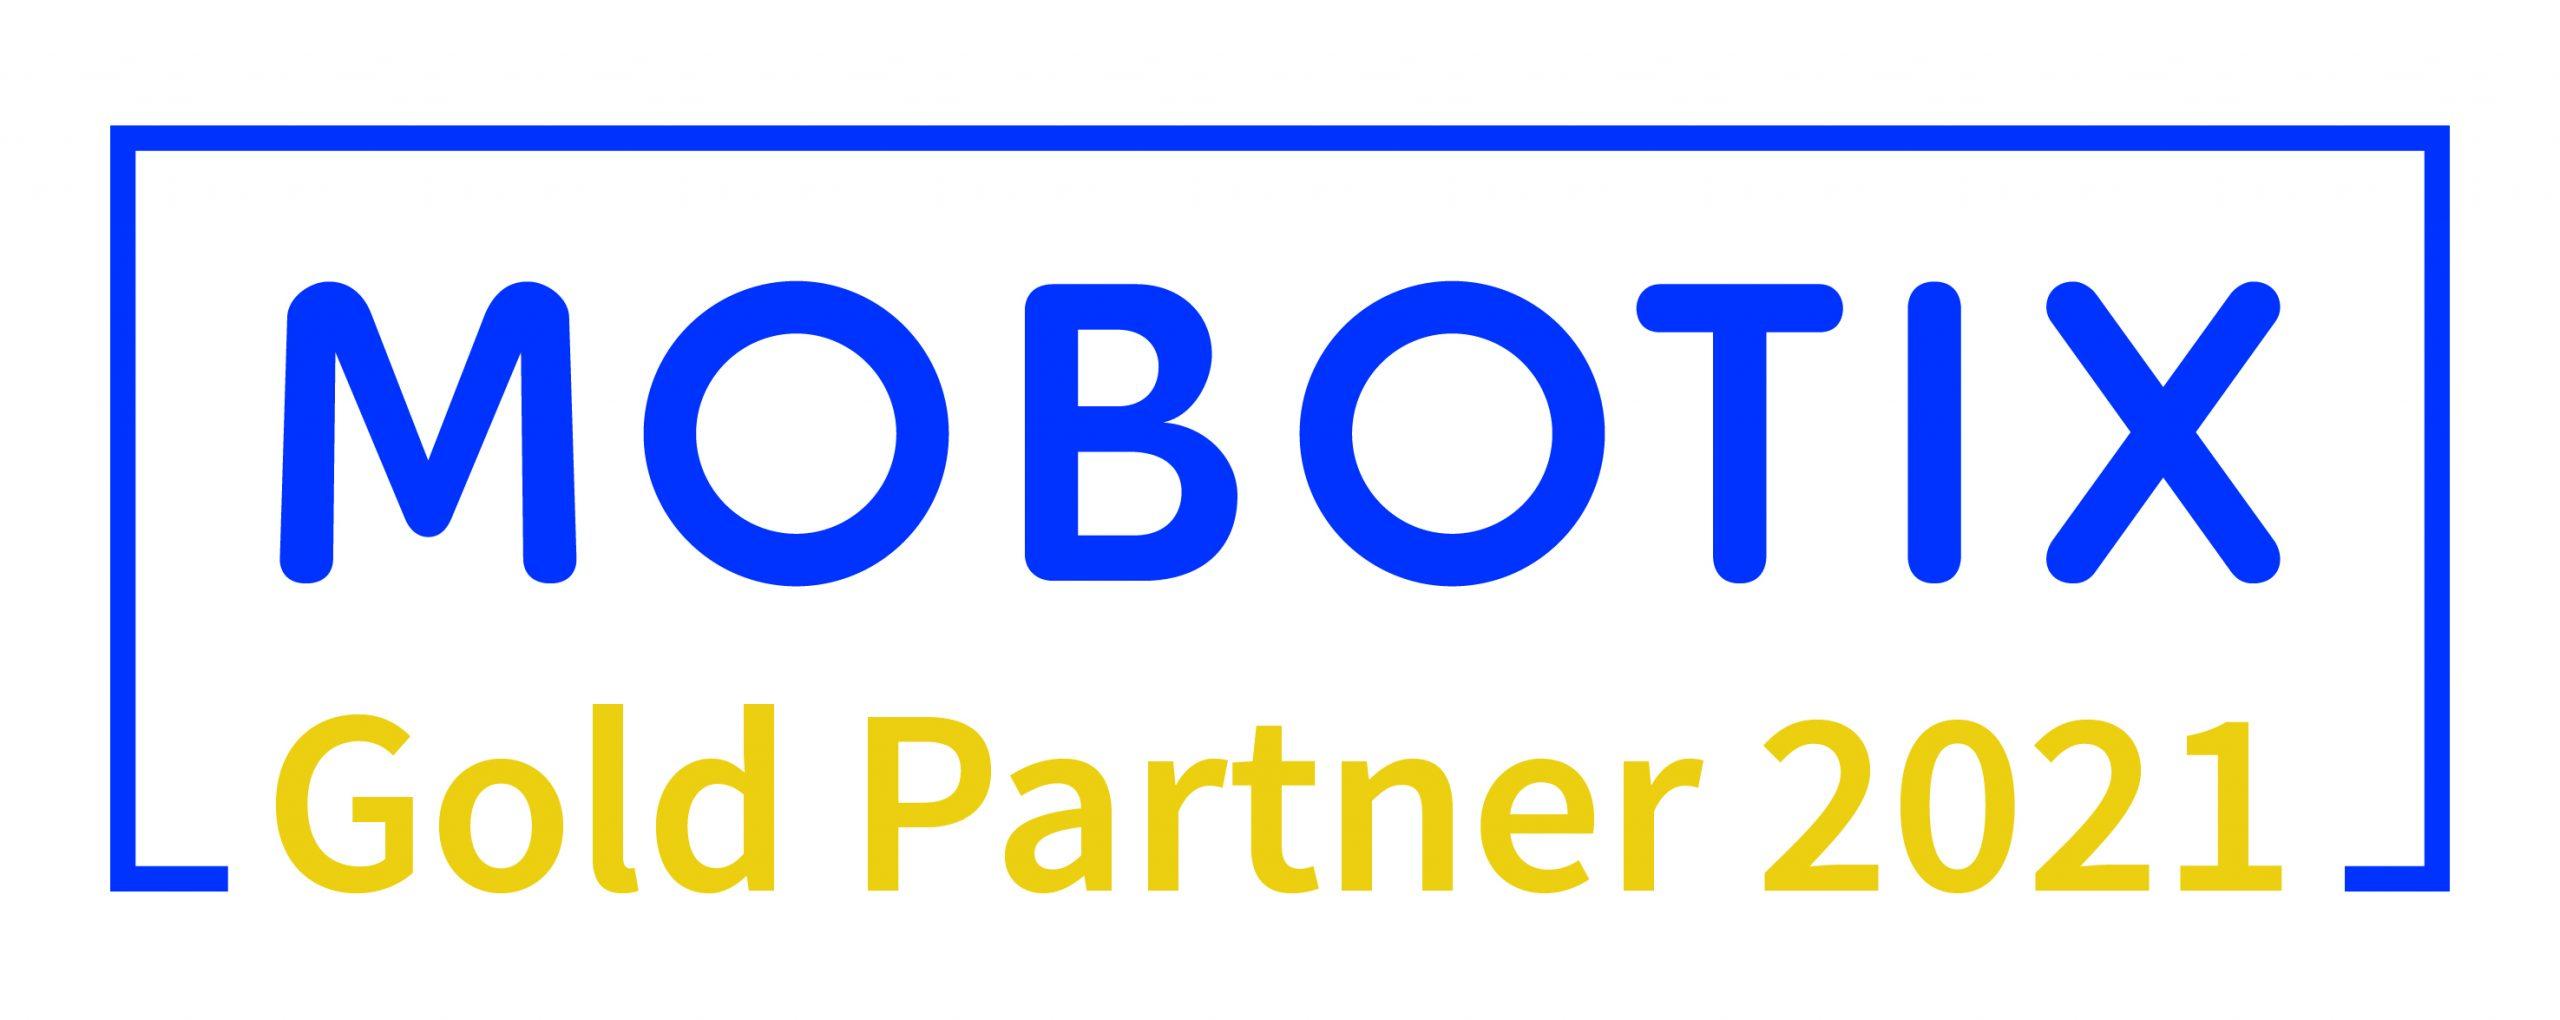 Mobotix Gold Partner Logo